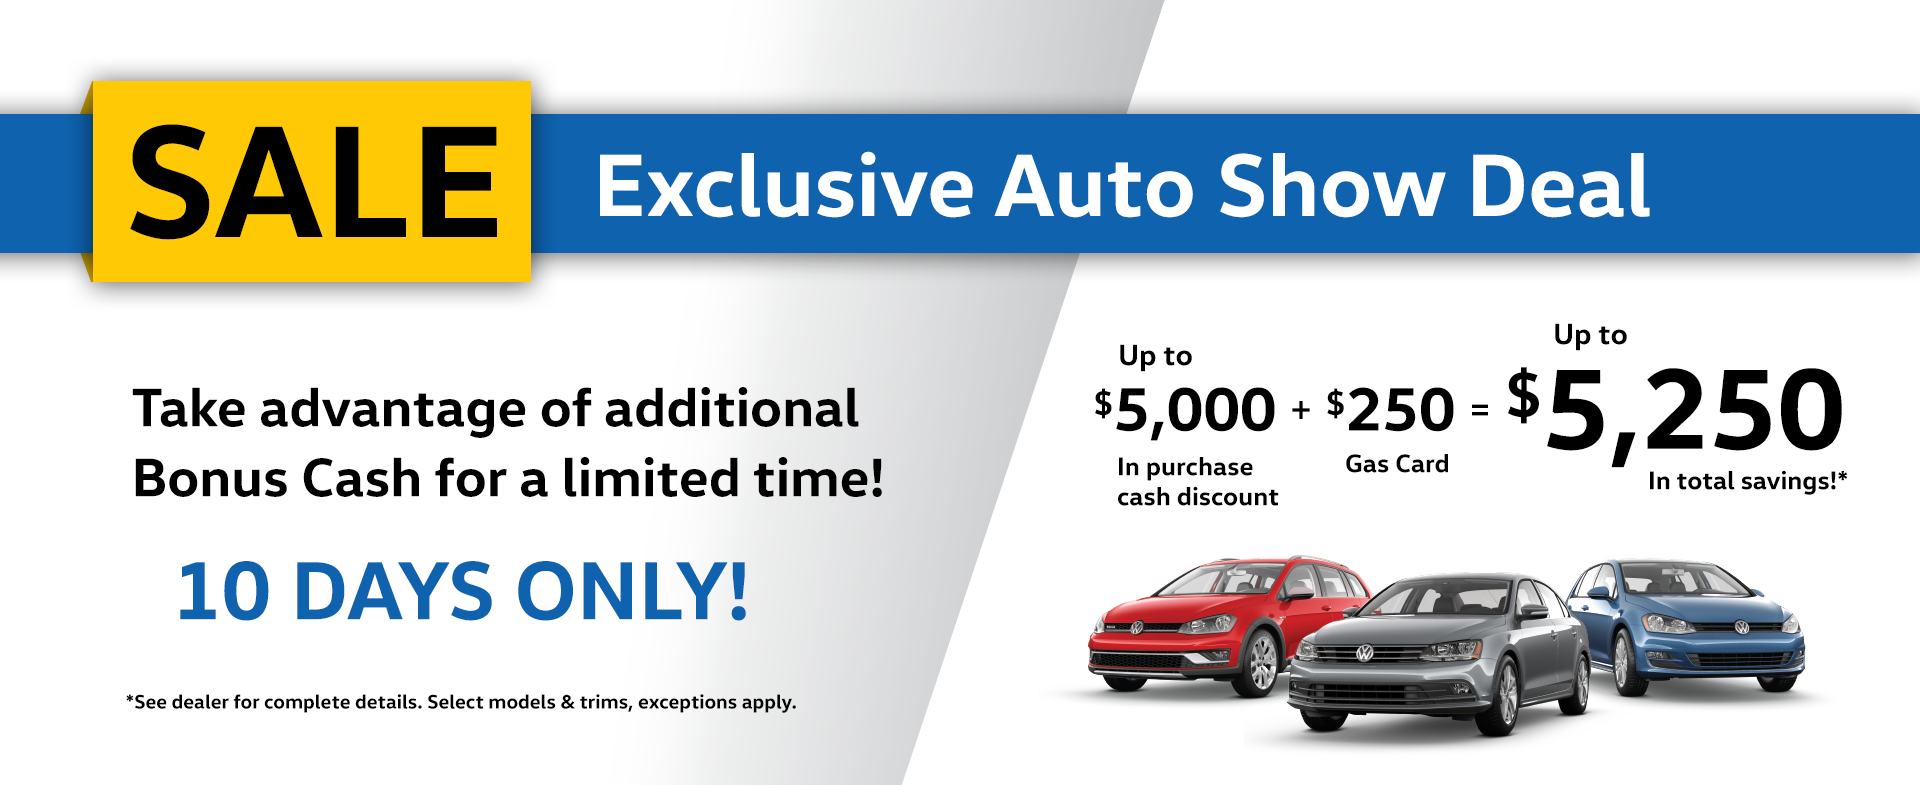 Auto Show Deal